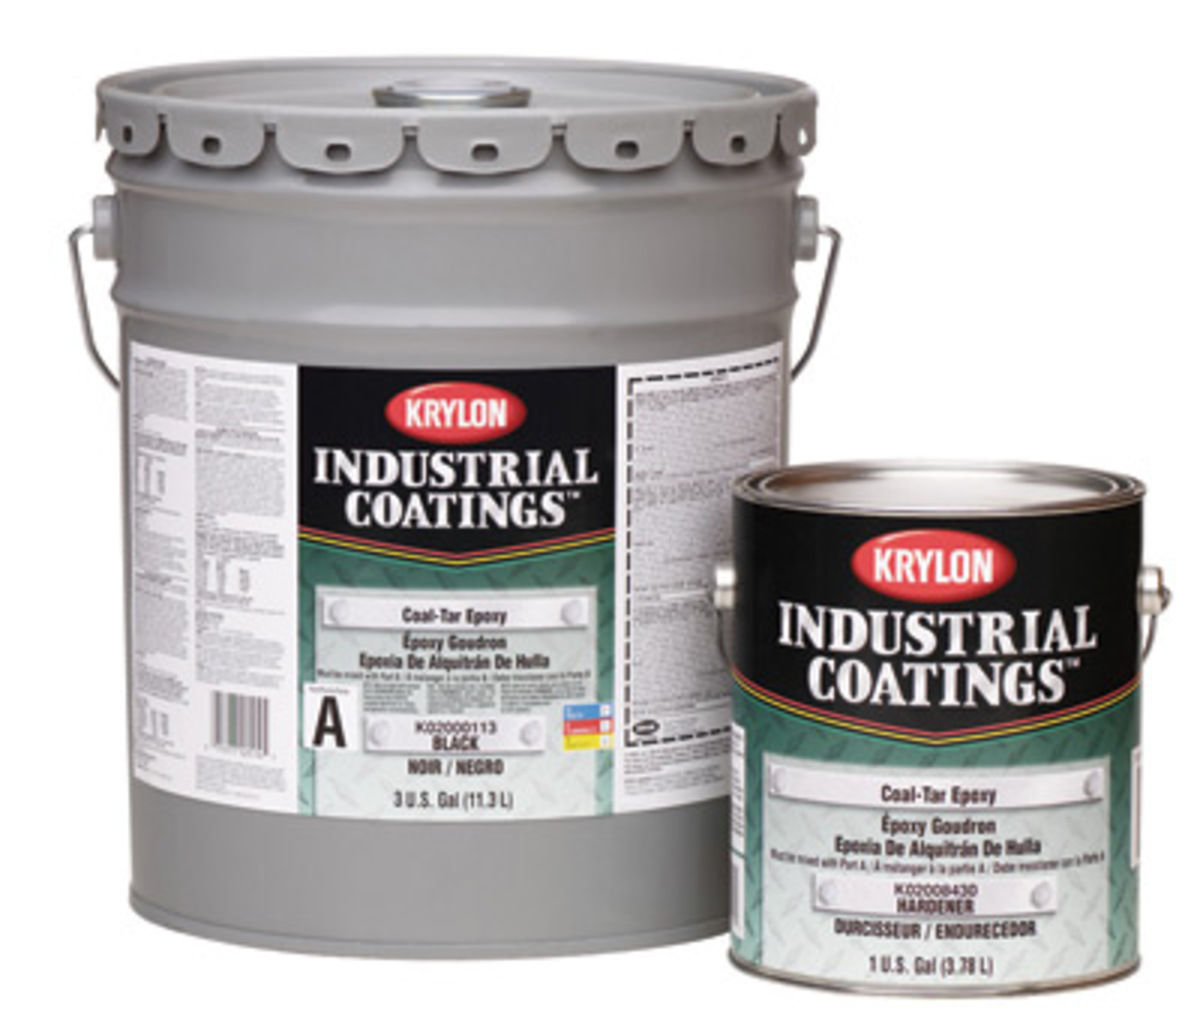 airgas k04k02000115 19 krylon products group 4 gallon